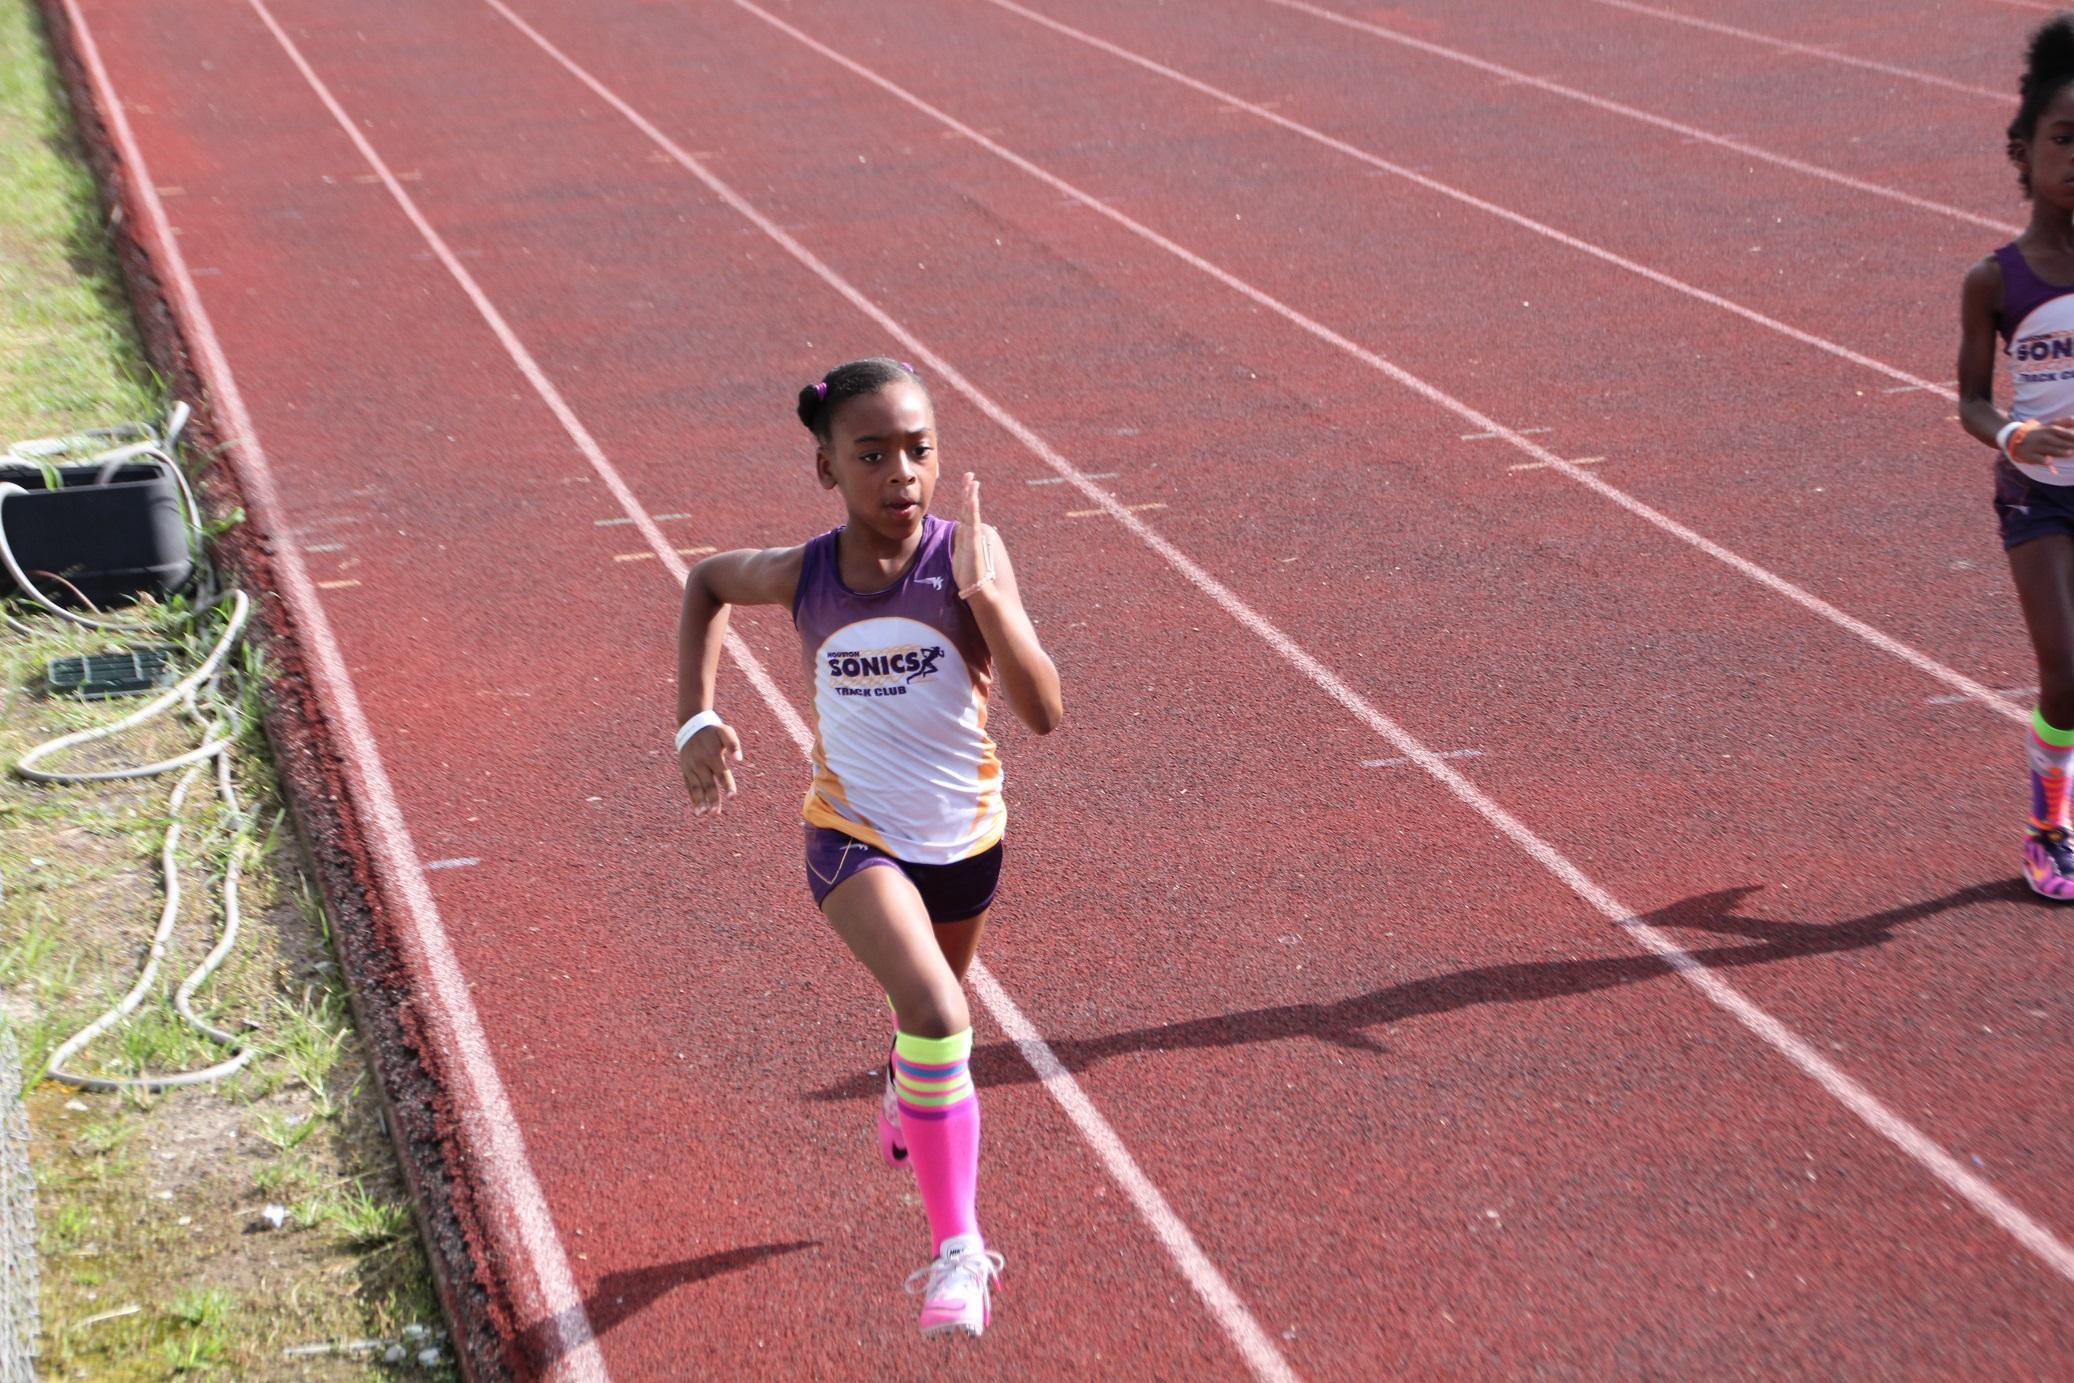 Hanna running the 100m